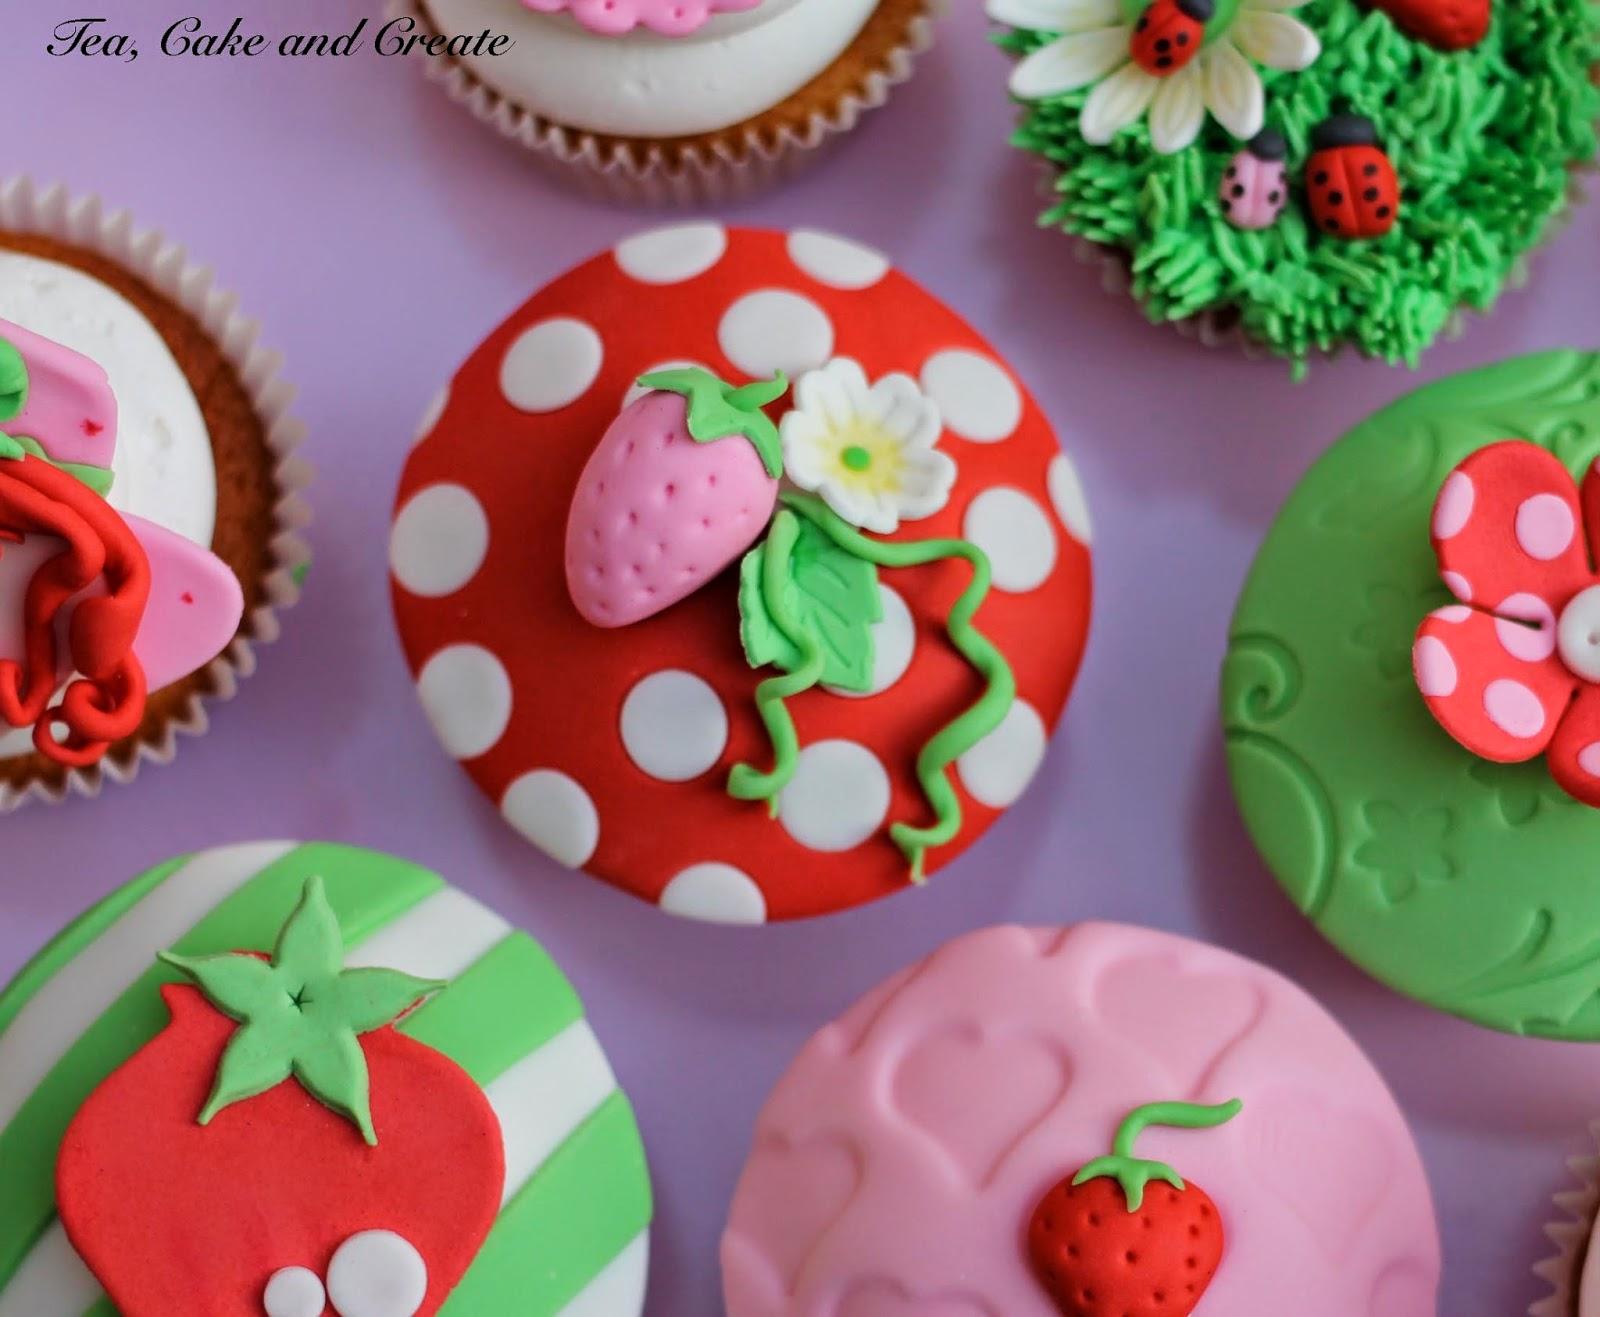 Tea Cake & Create Strawberry Shortcake Cupcake Toppers